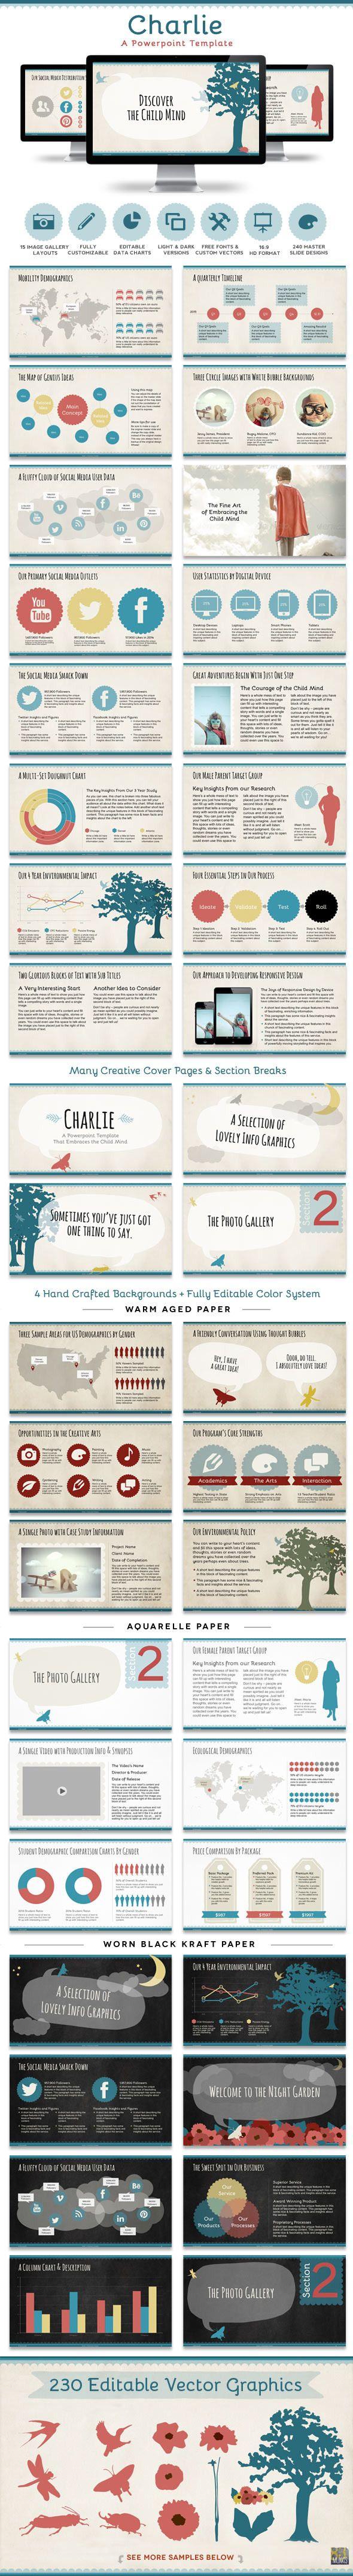 Charlie Powerpoint Presentation Template - Creative PowerPoint Templates